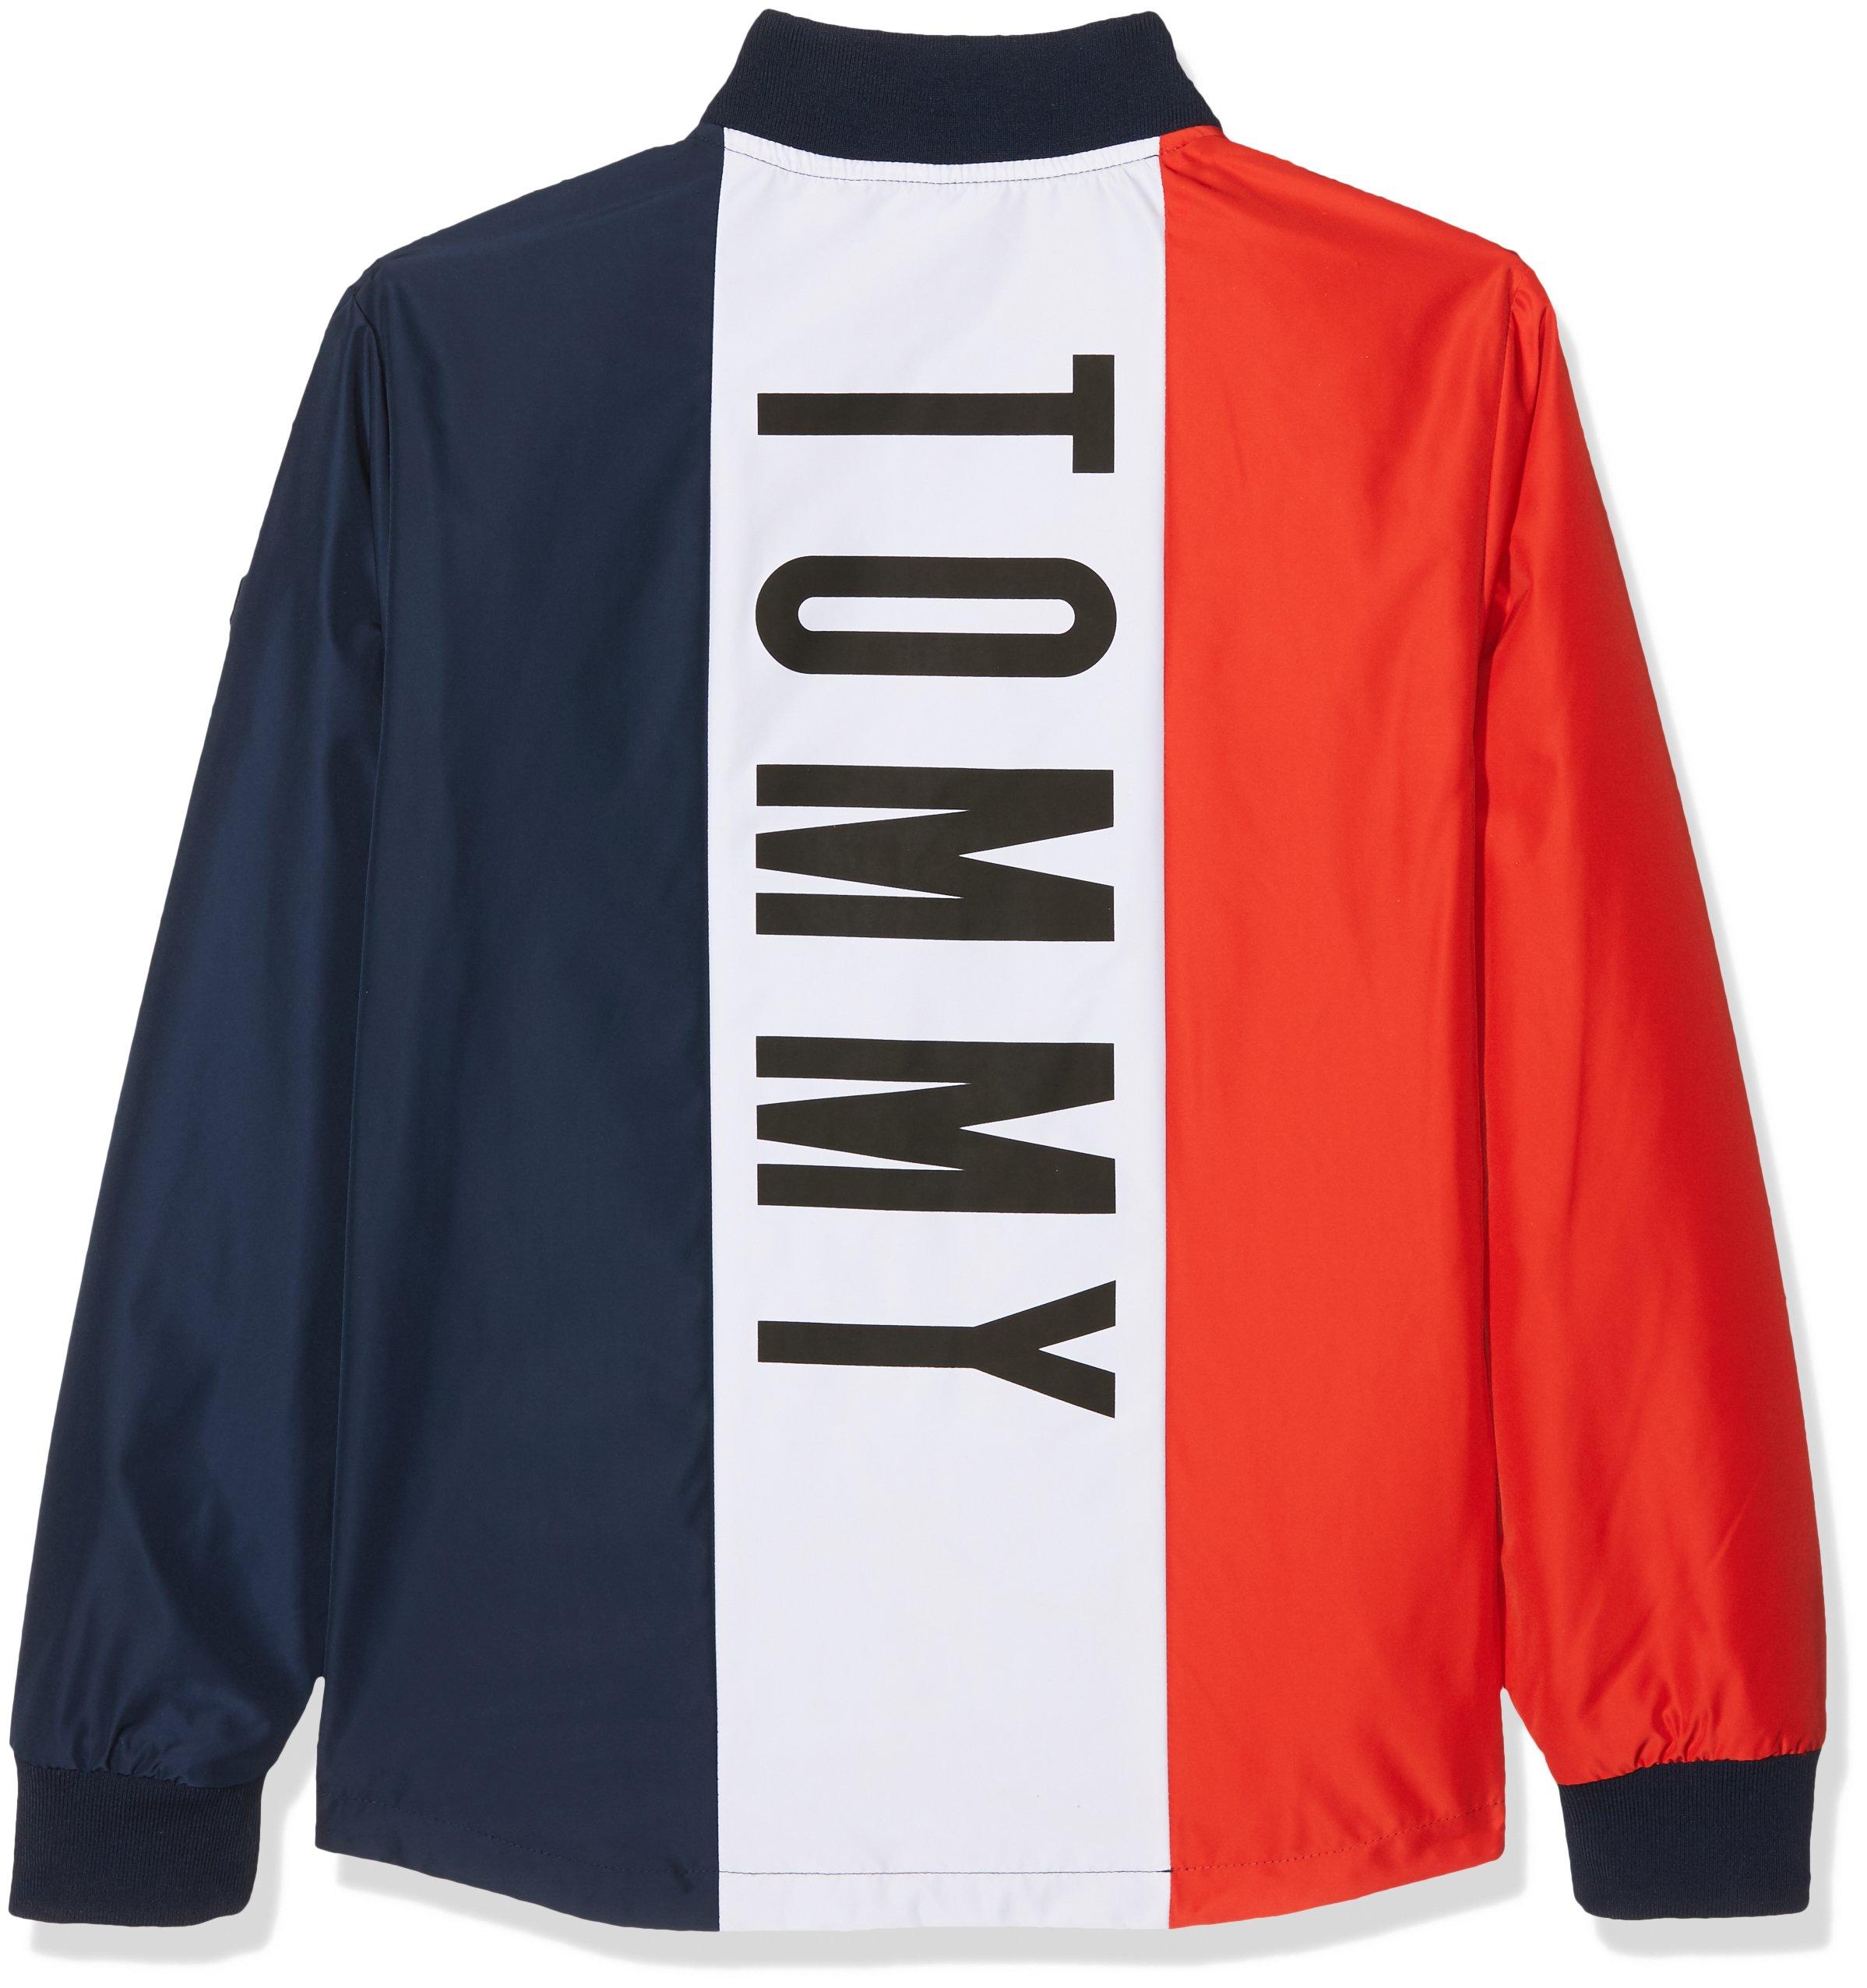 Tommy Hilfiger S Reversible Cracker Jacket Chaqueta para Niños